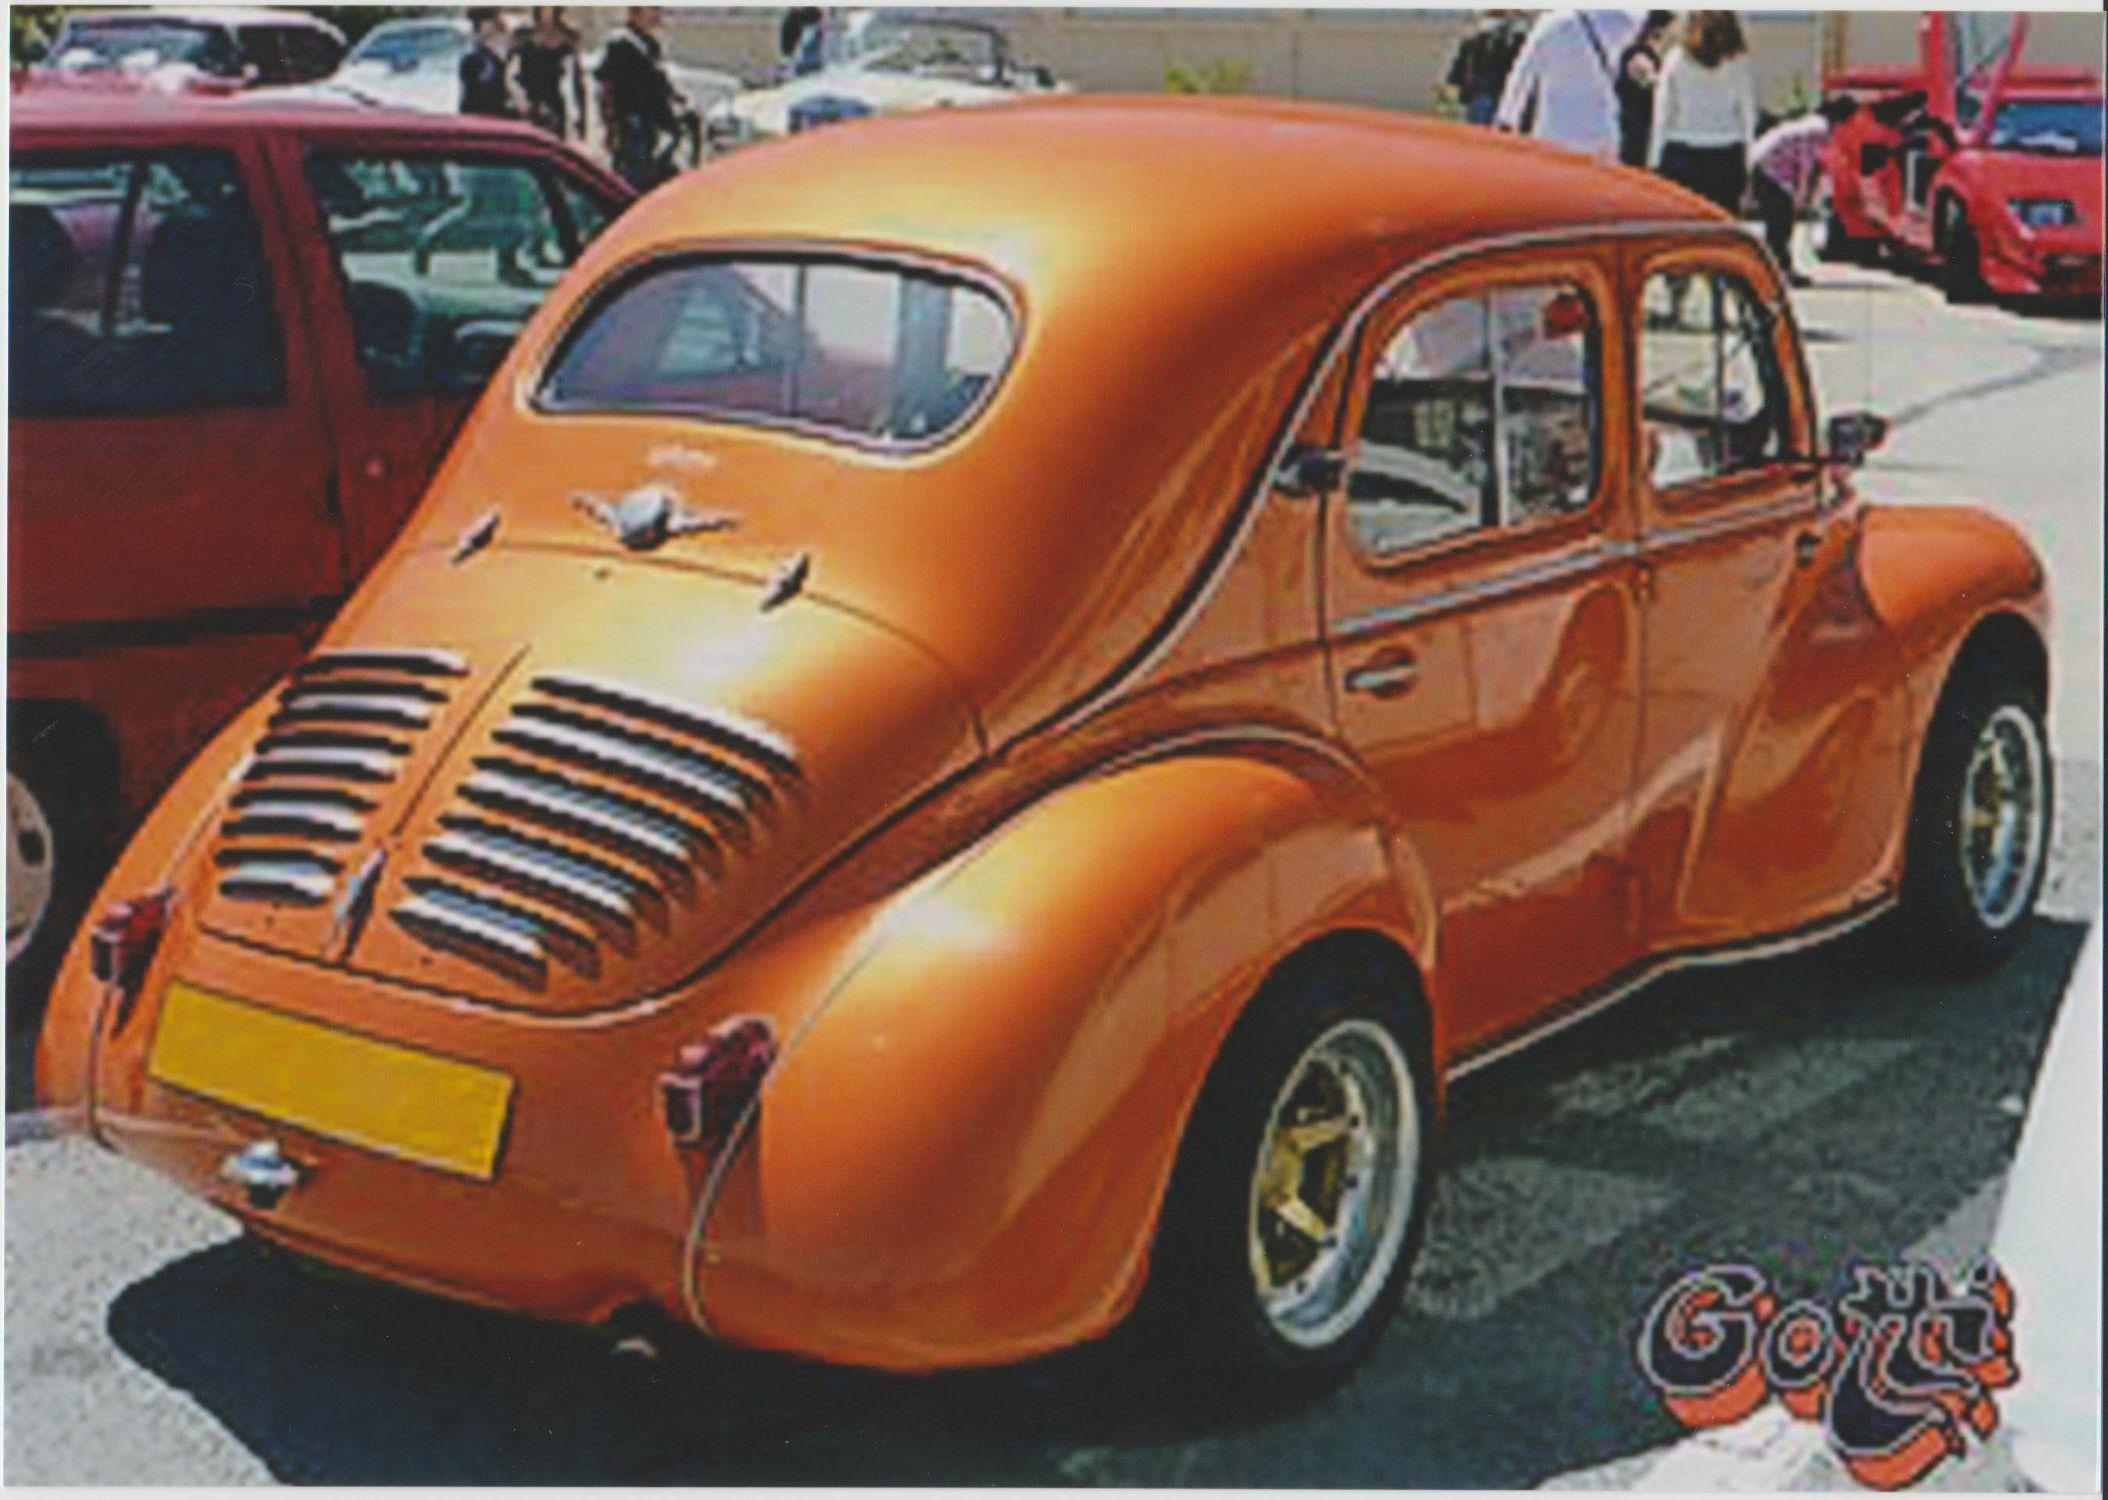 4 Cv Proto Inconnu Voitures Anciennes Voiture Renault Voiture Vintage